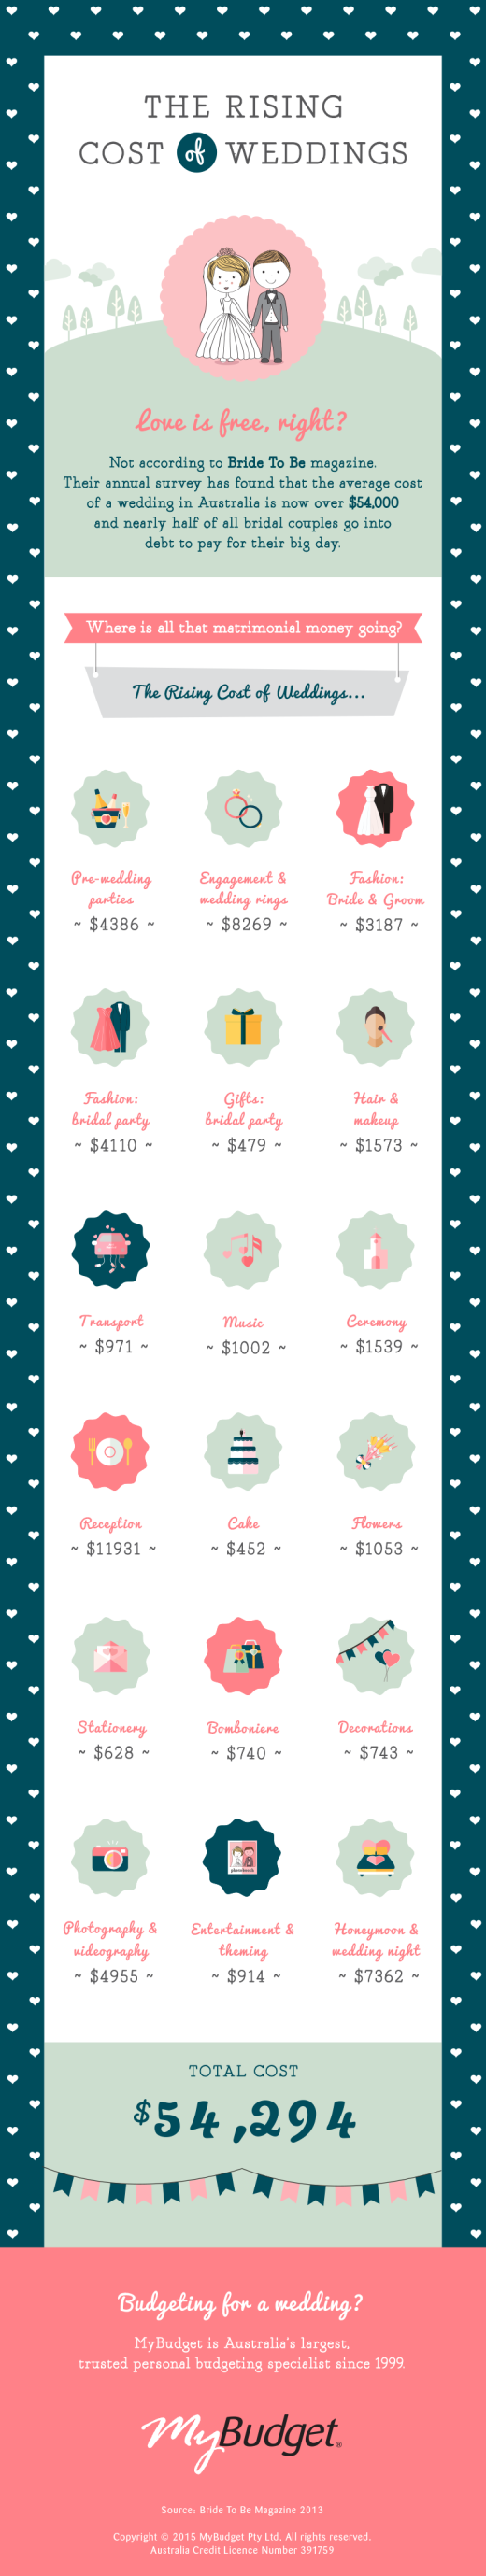 MyBudget Wedding Infographic Feb 2015